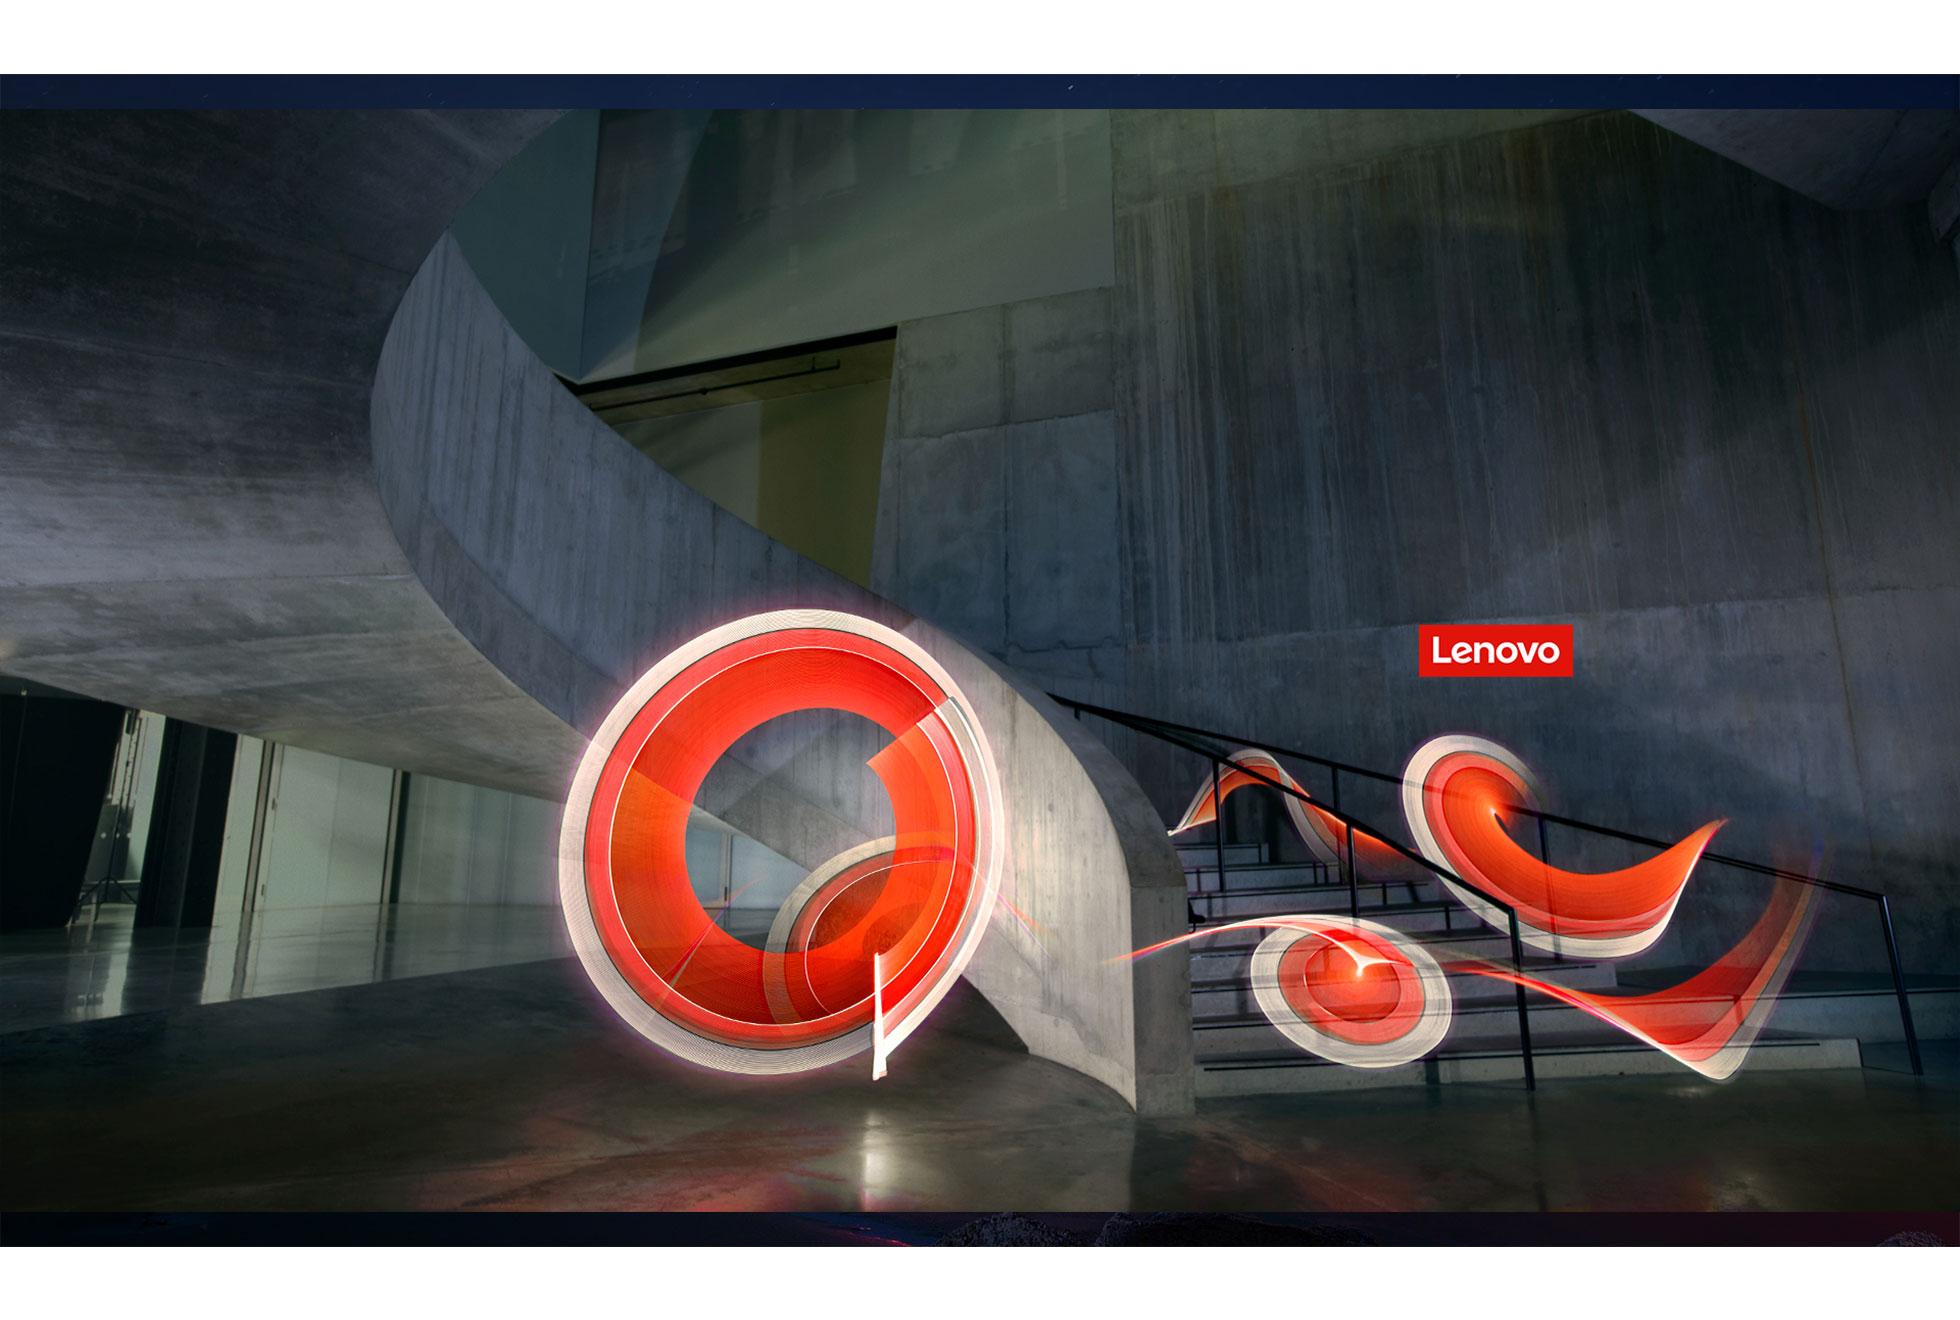 Lenovo-Light-Painting-Backgrounds-by-Sola-Lightbombing-Tate-Modern